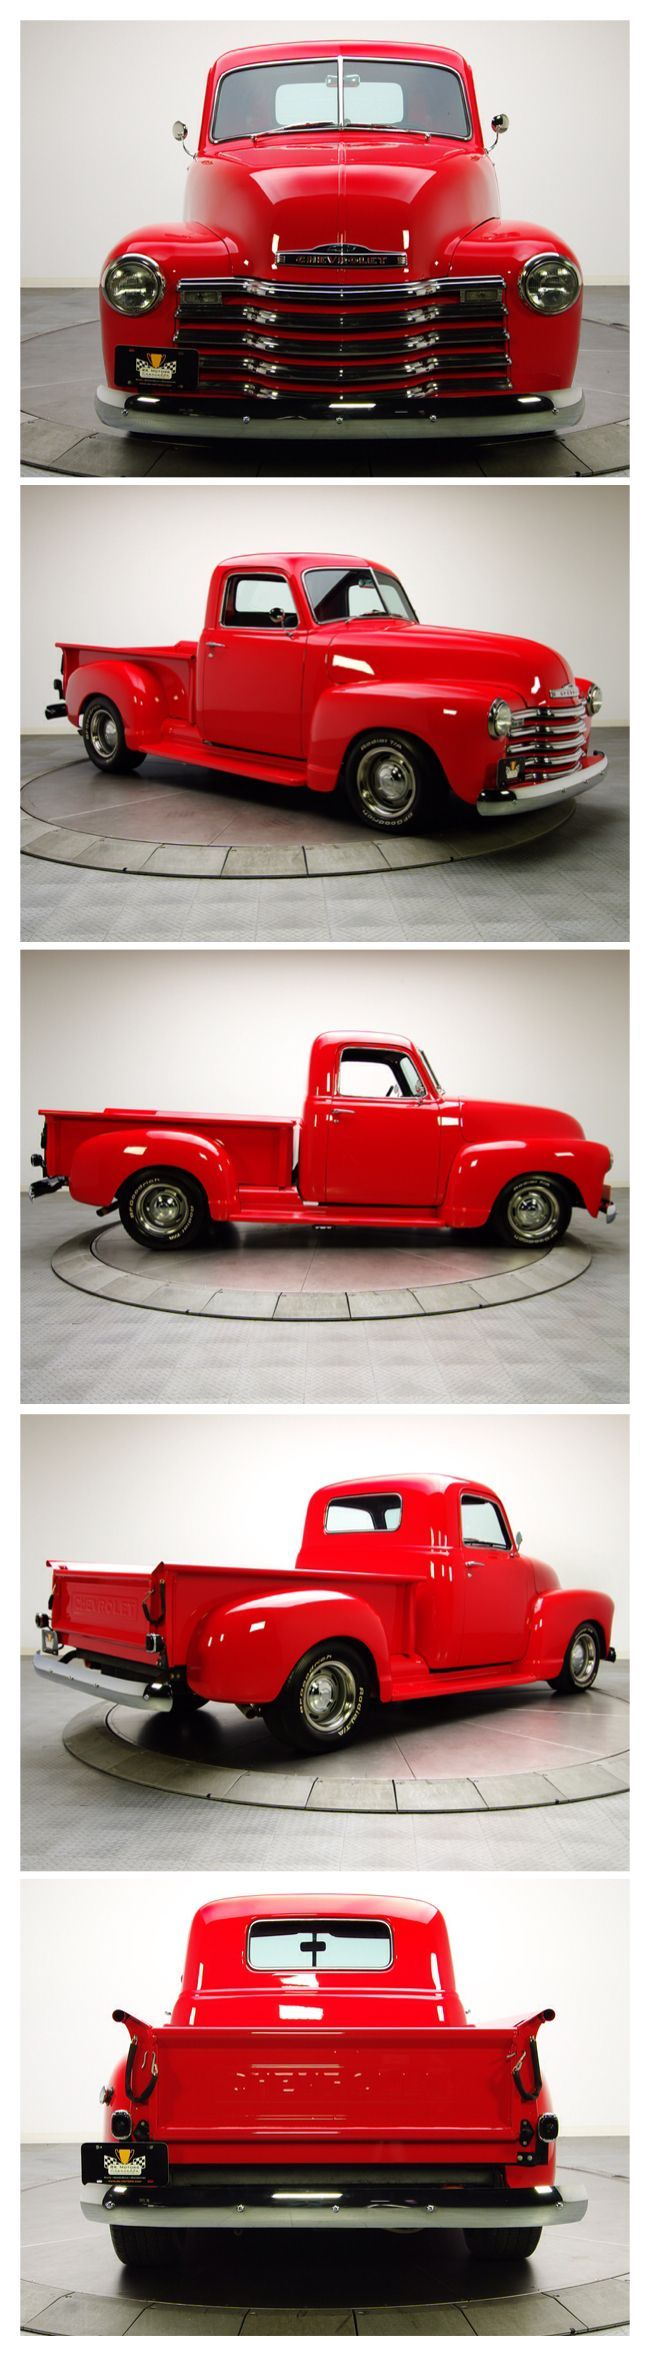 1948. Chevrolet. 3100 Pickup Truck.